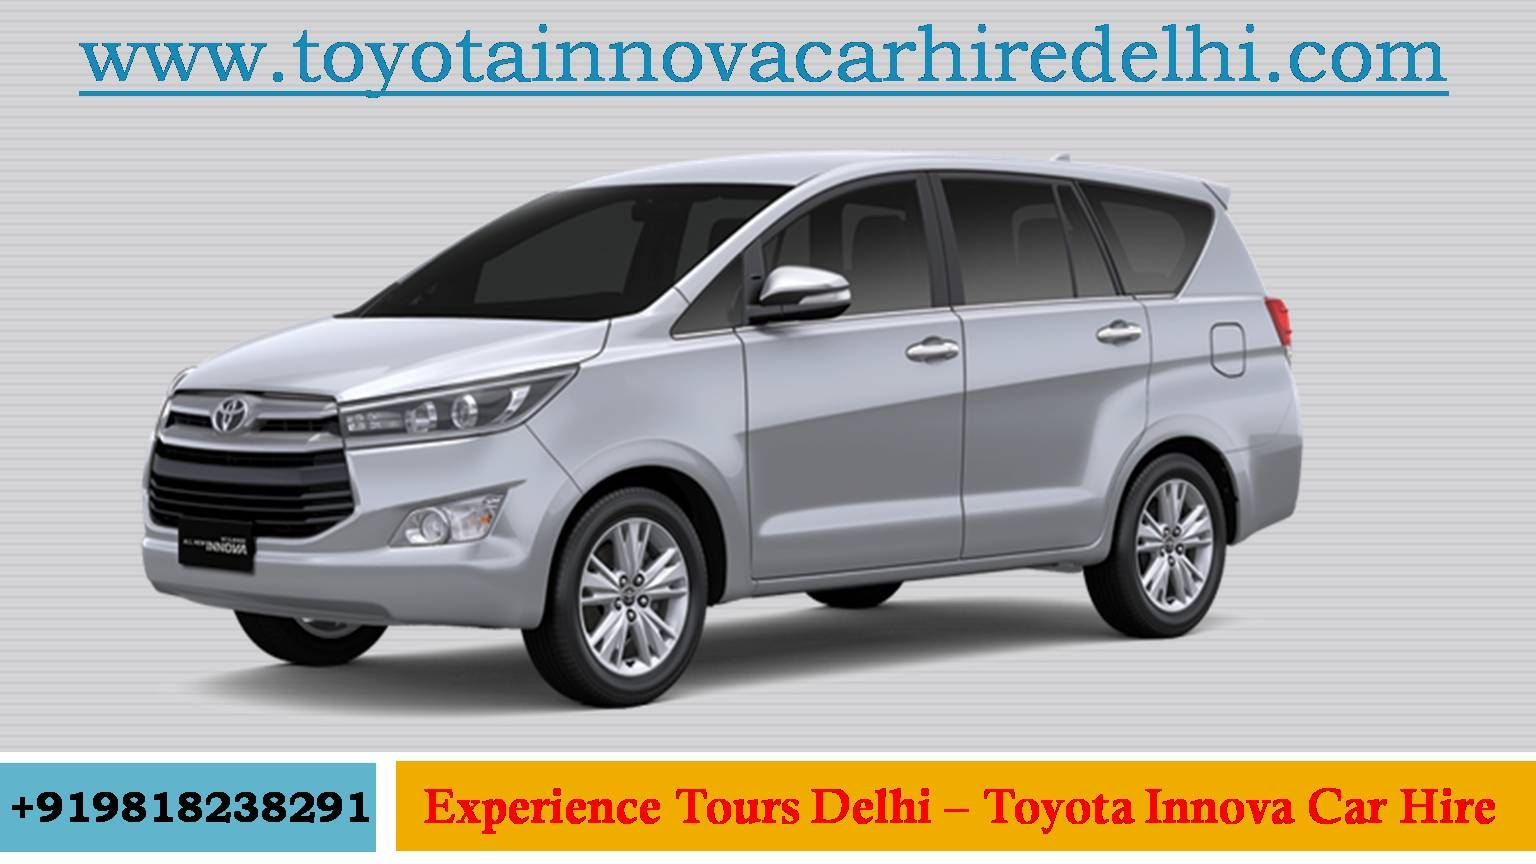 Toyota Innova Car Hire   Toyota Innova Car Hire Bookmarking